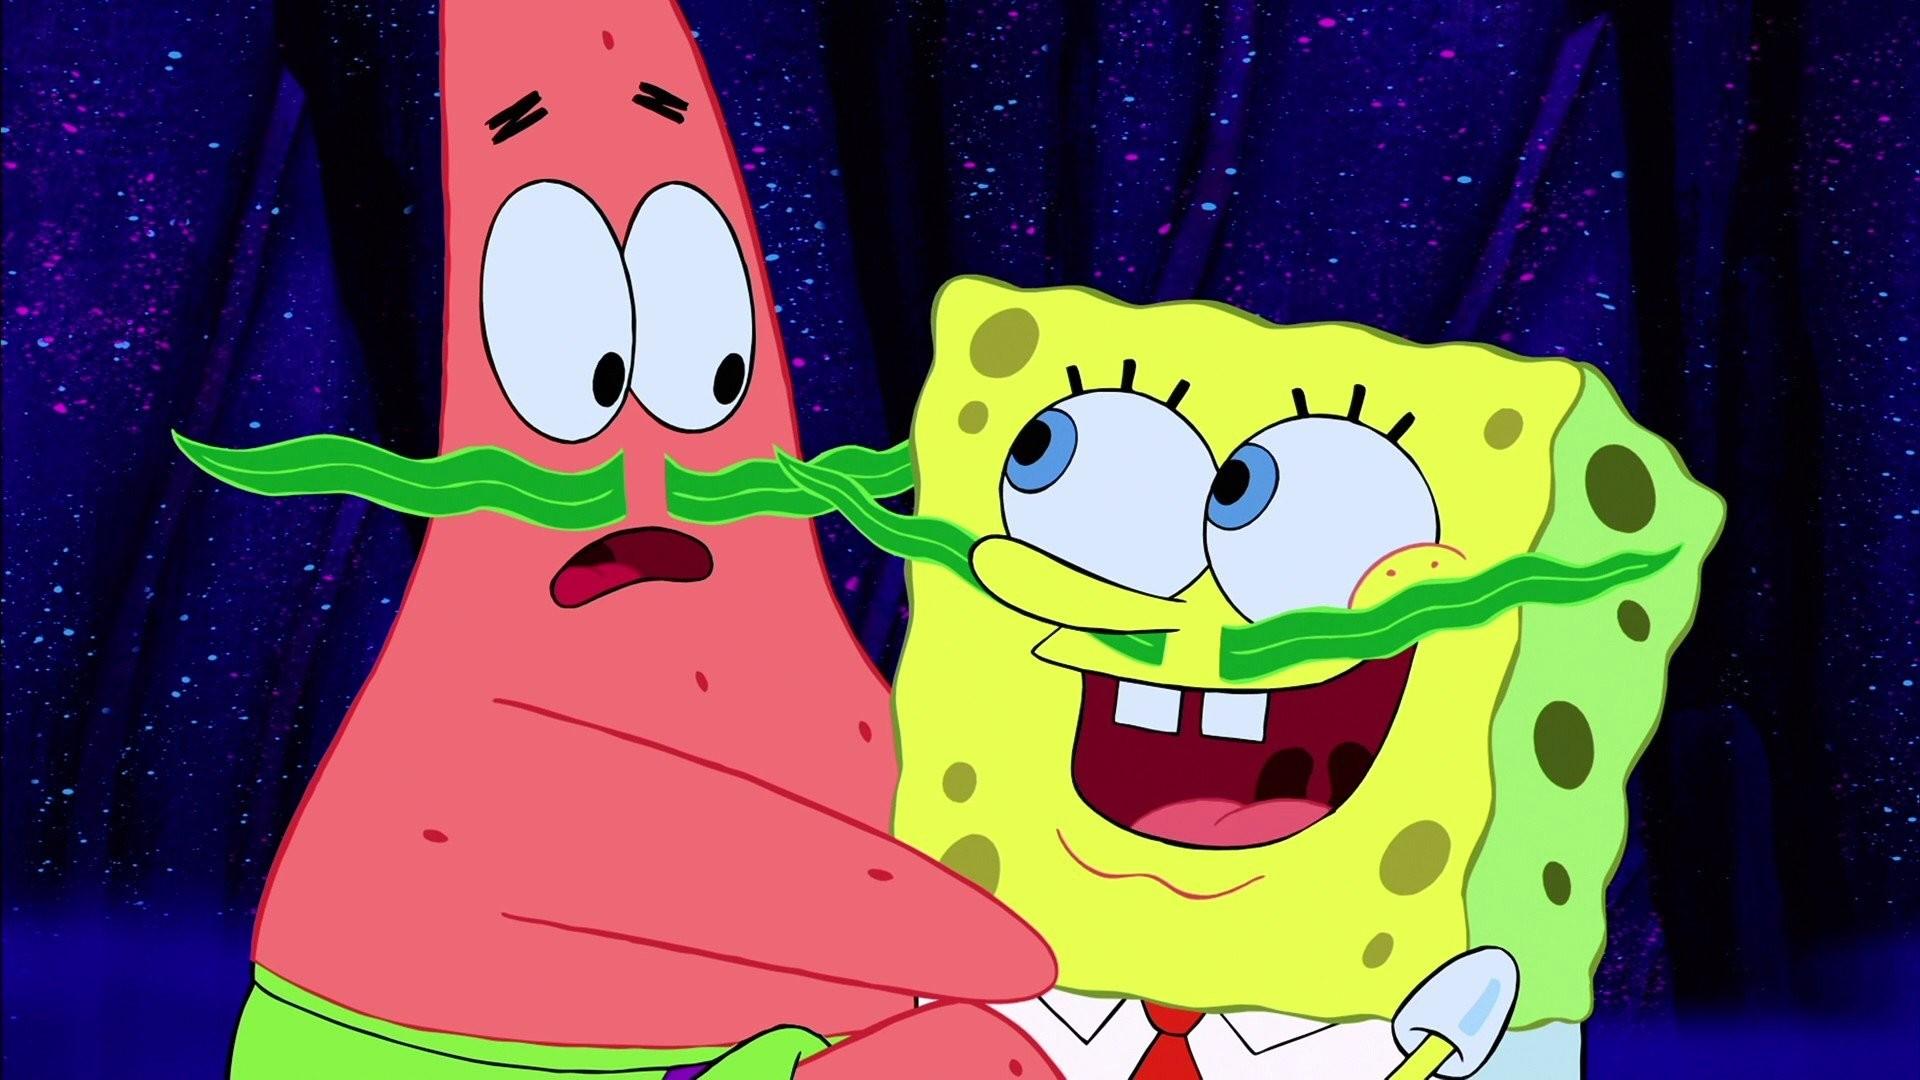 Spongebob And Patrick 747161